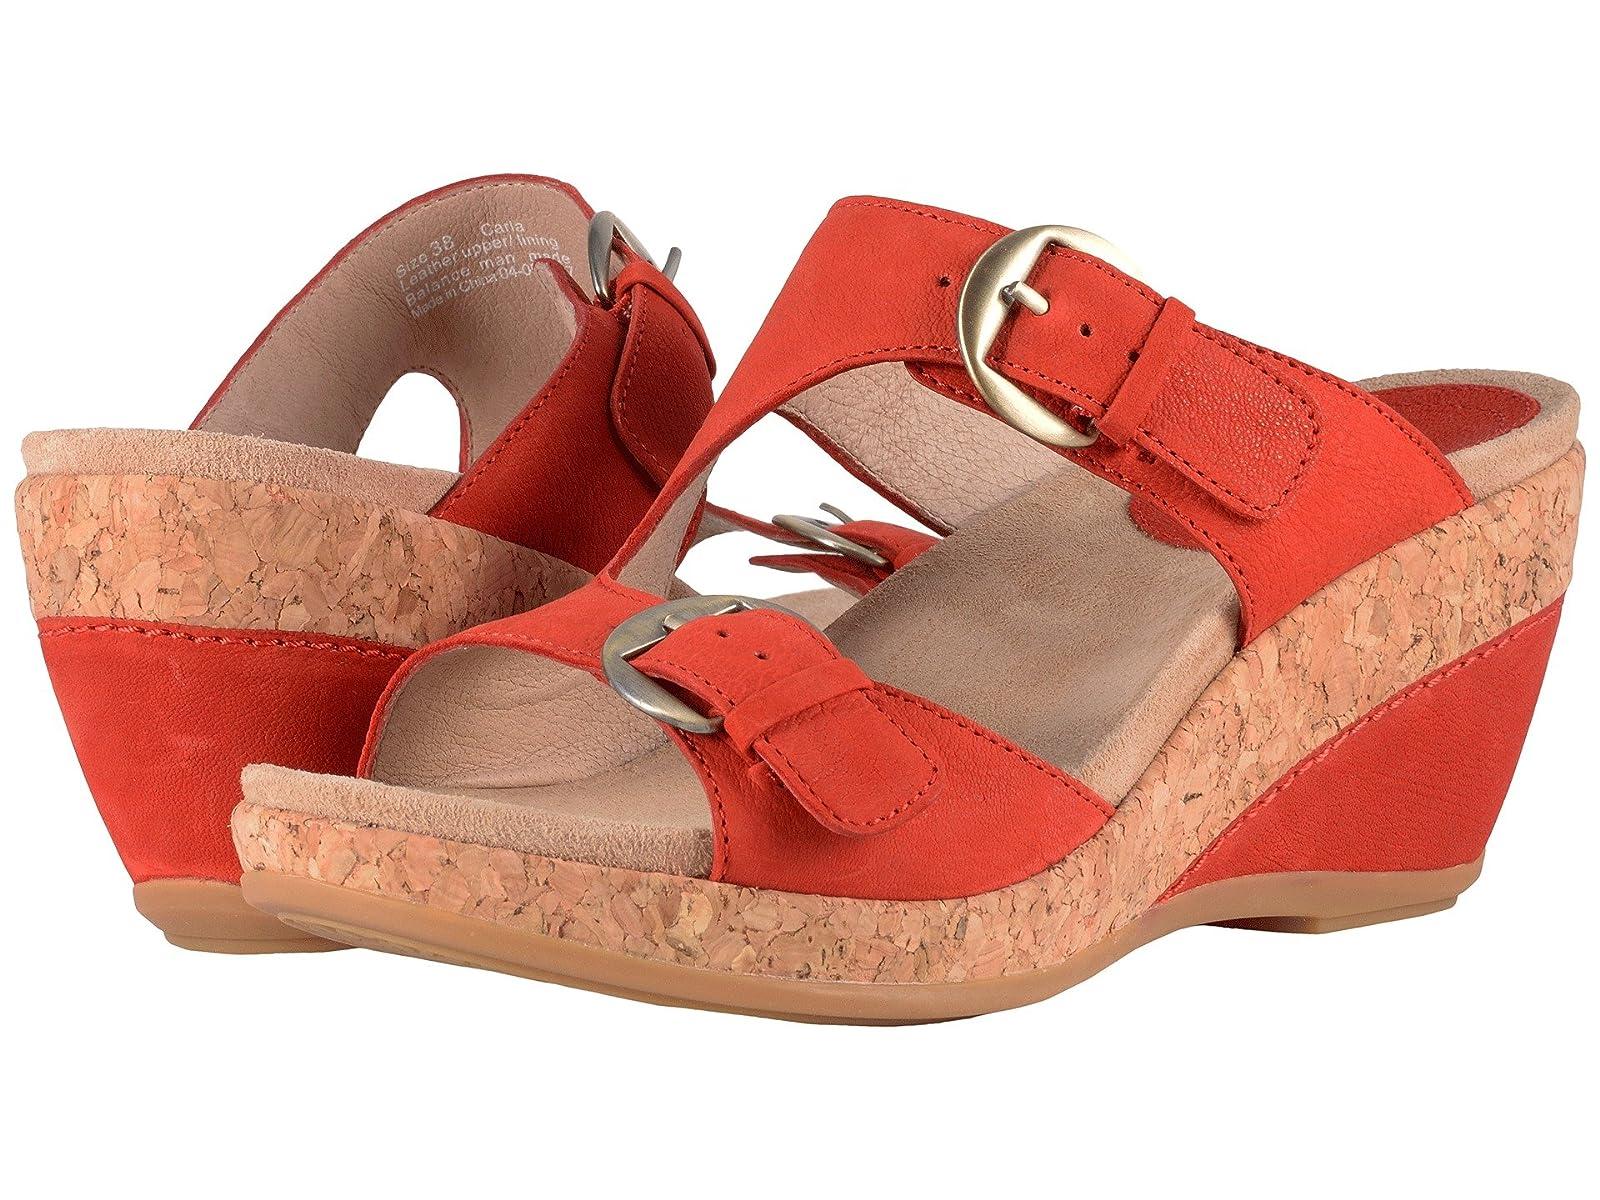 Dansko CarlaCheap and distinctive eye-catching shoes